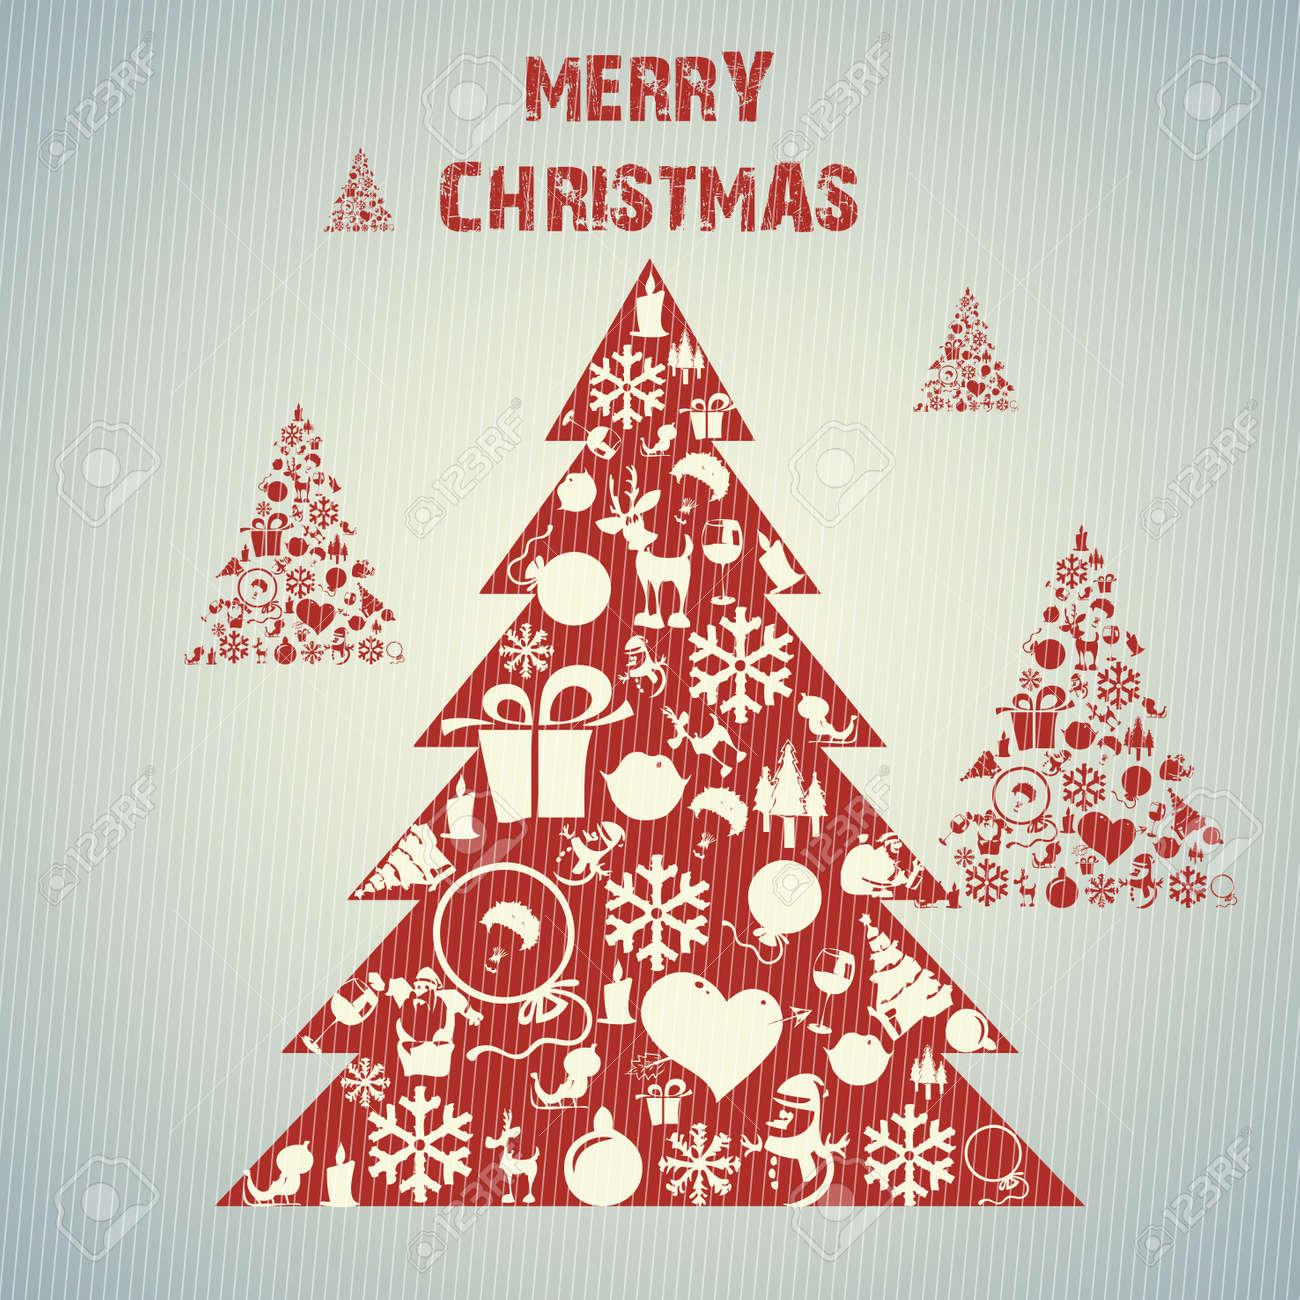 Christmas tree applique vector  background. Postcard Stock Vector - 15500975